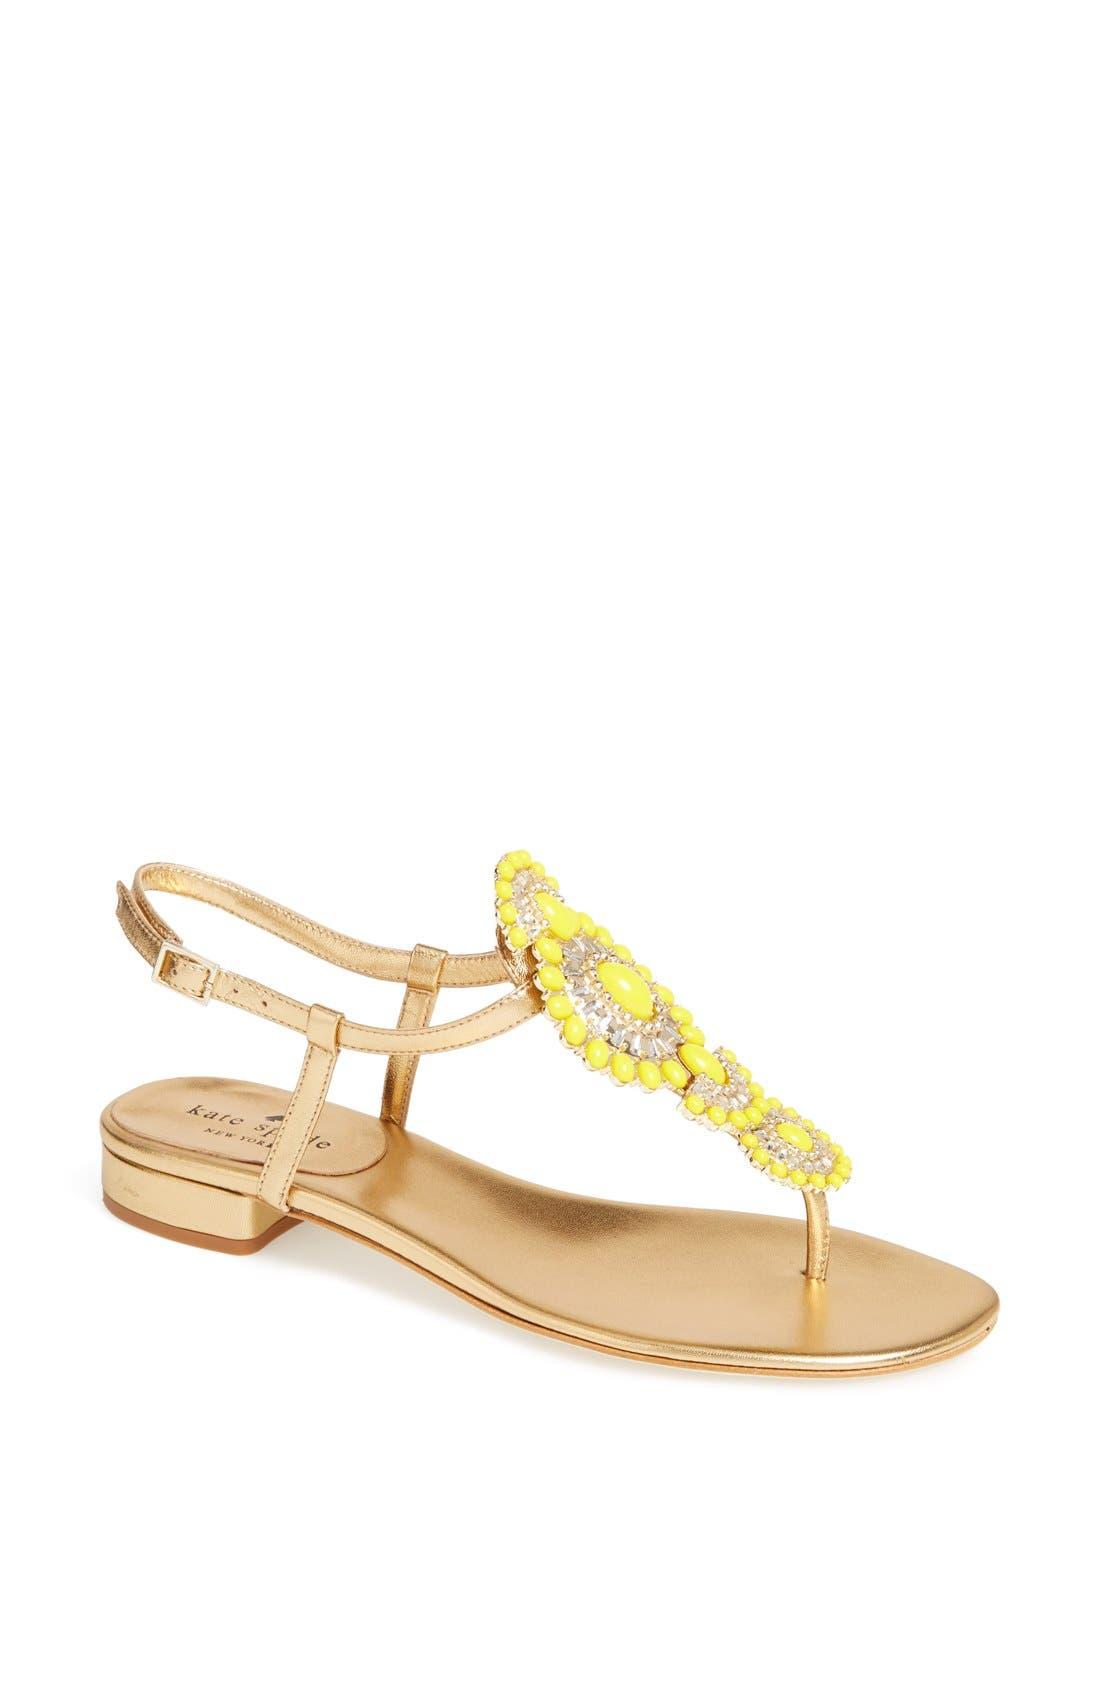 Main Image - kate spade new york 'fiore' sandal